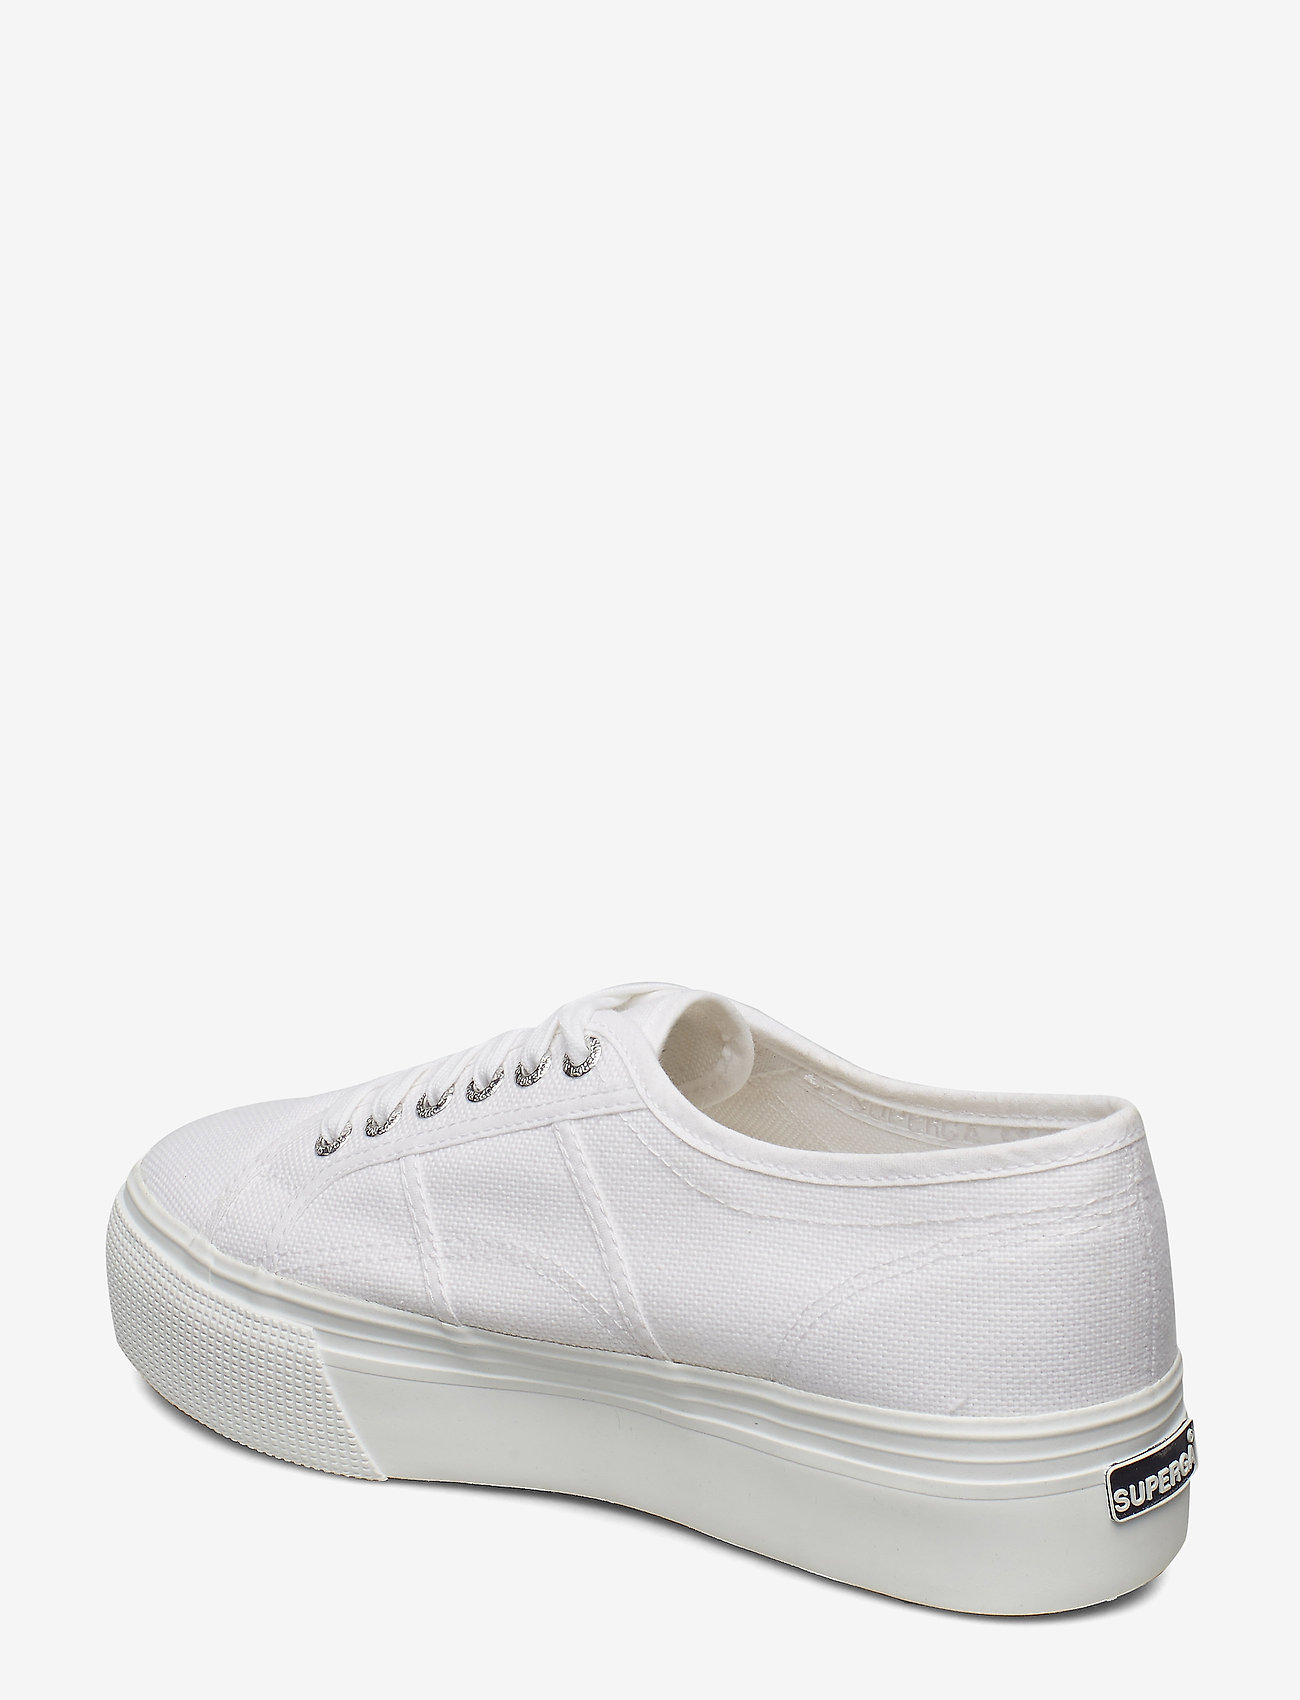 Superga - Superga 2790-Acotw Linea - låga sneakers - white - 1